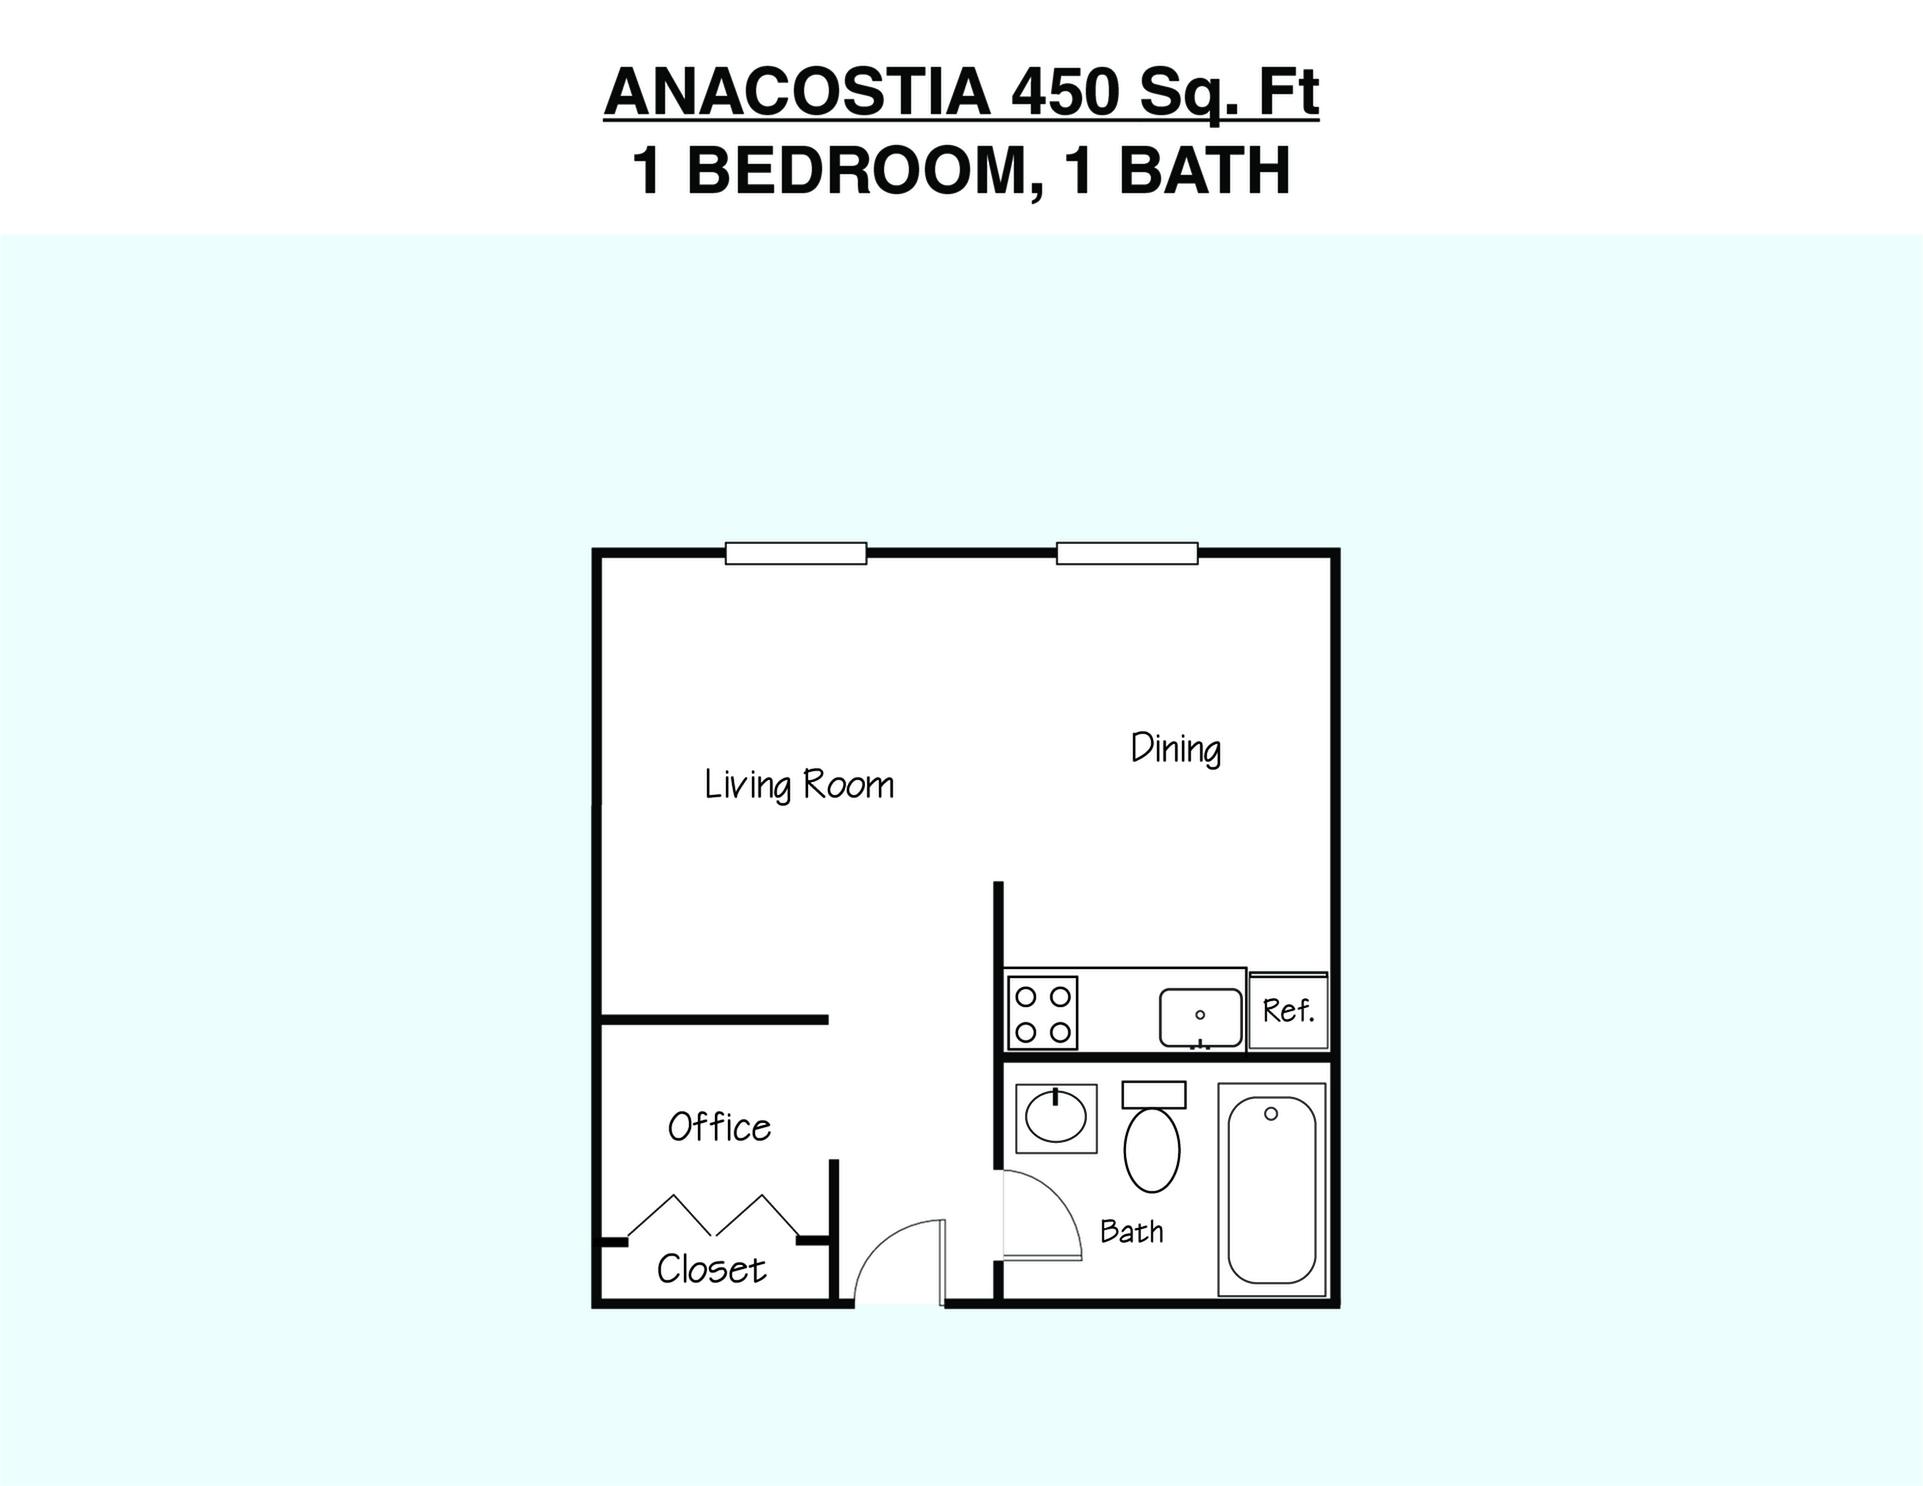 Anacostia Floor Plan